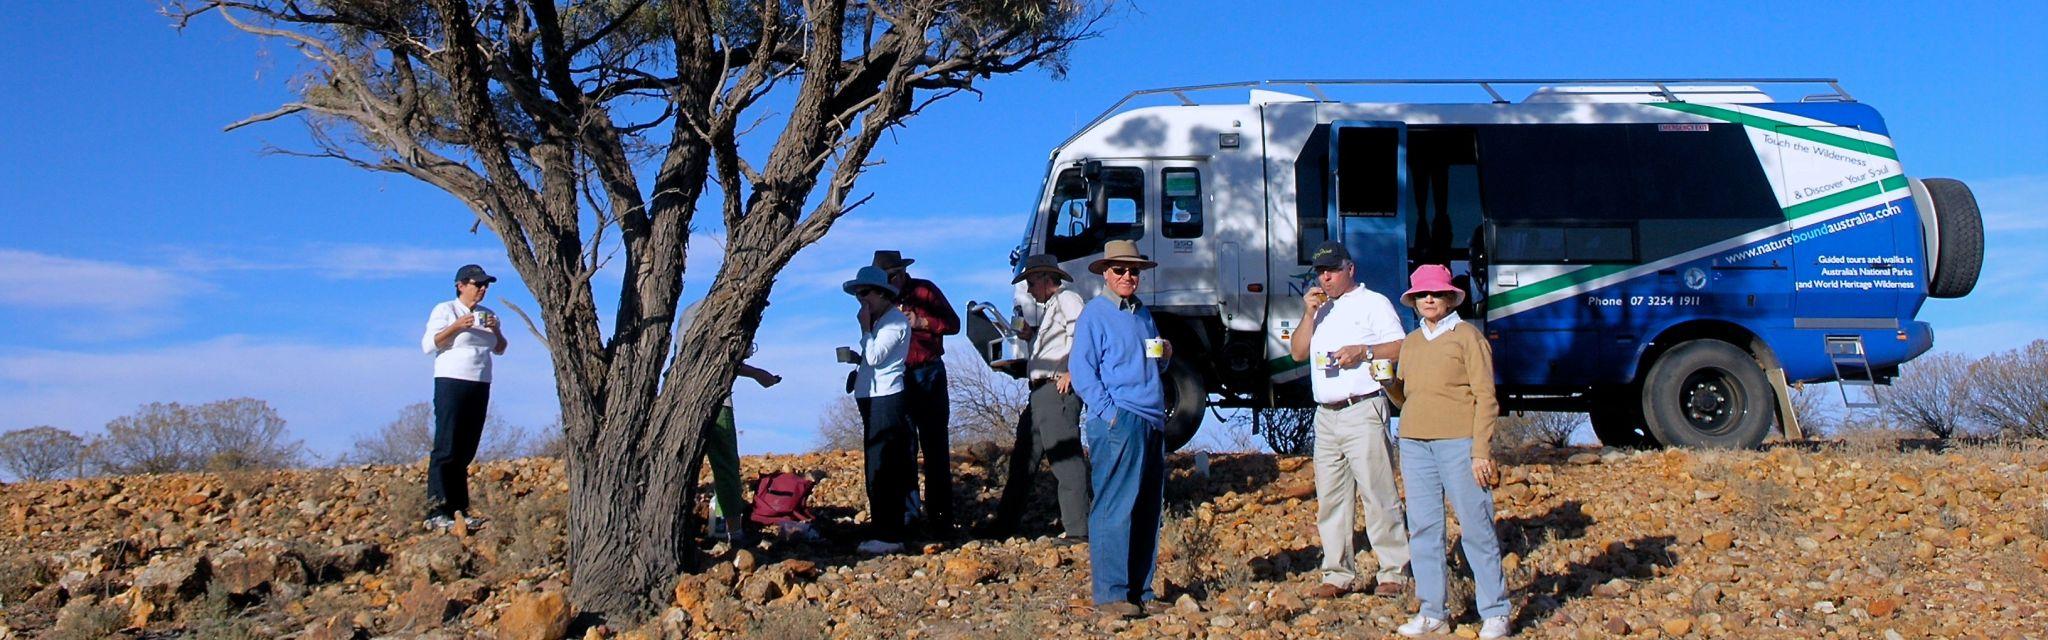 Tea break near tour transport on Mt Wood Station